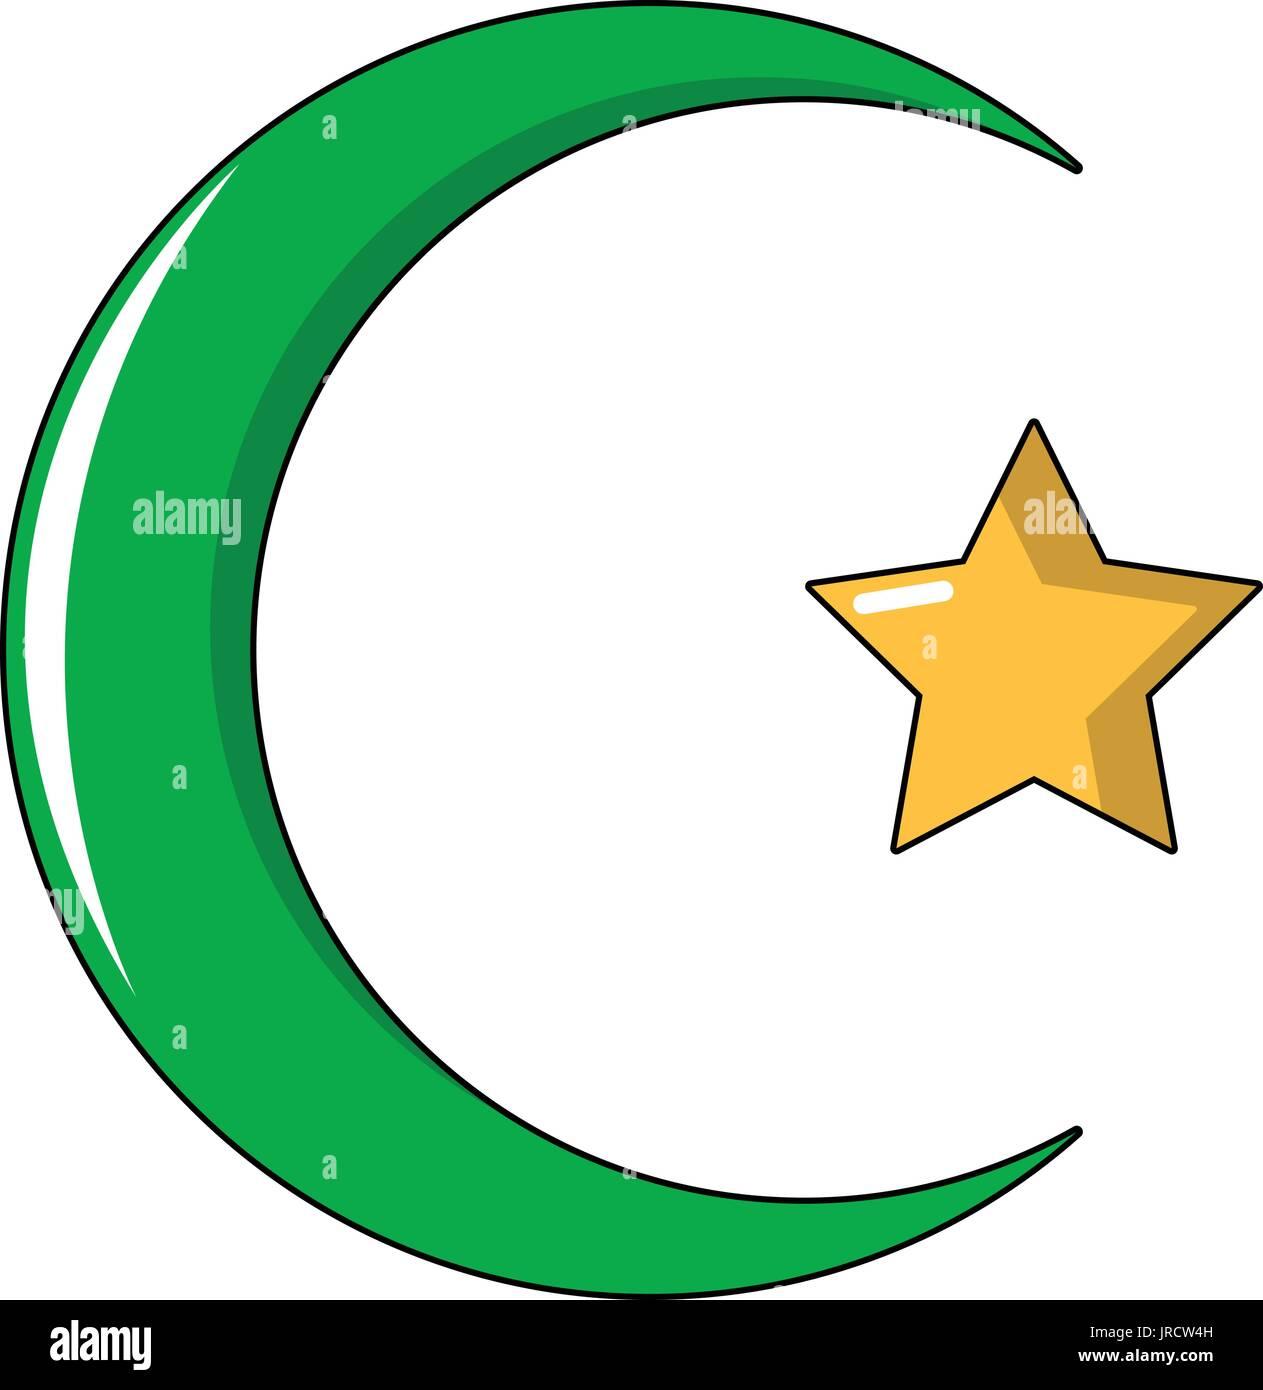 Starcrescent Symbol Of Islam Icon Cartoon Style Stock Vector Art